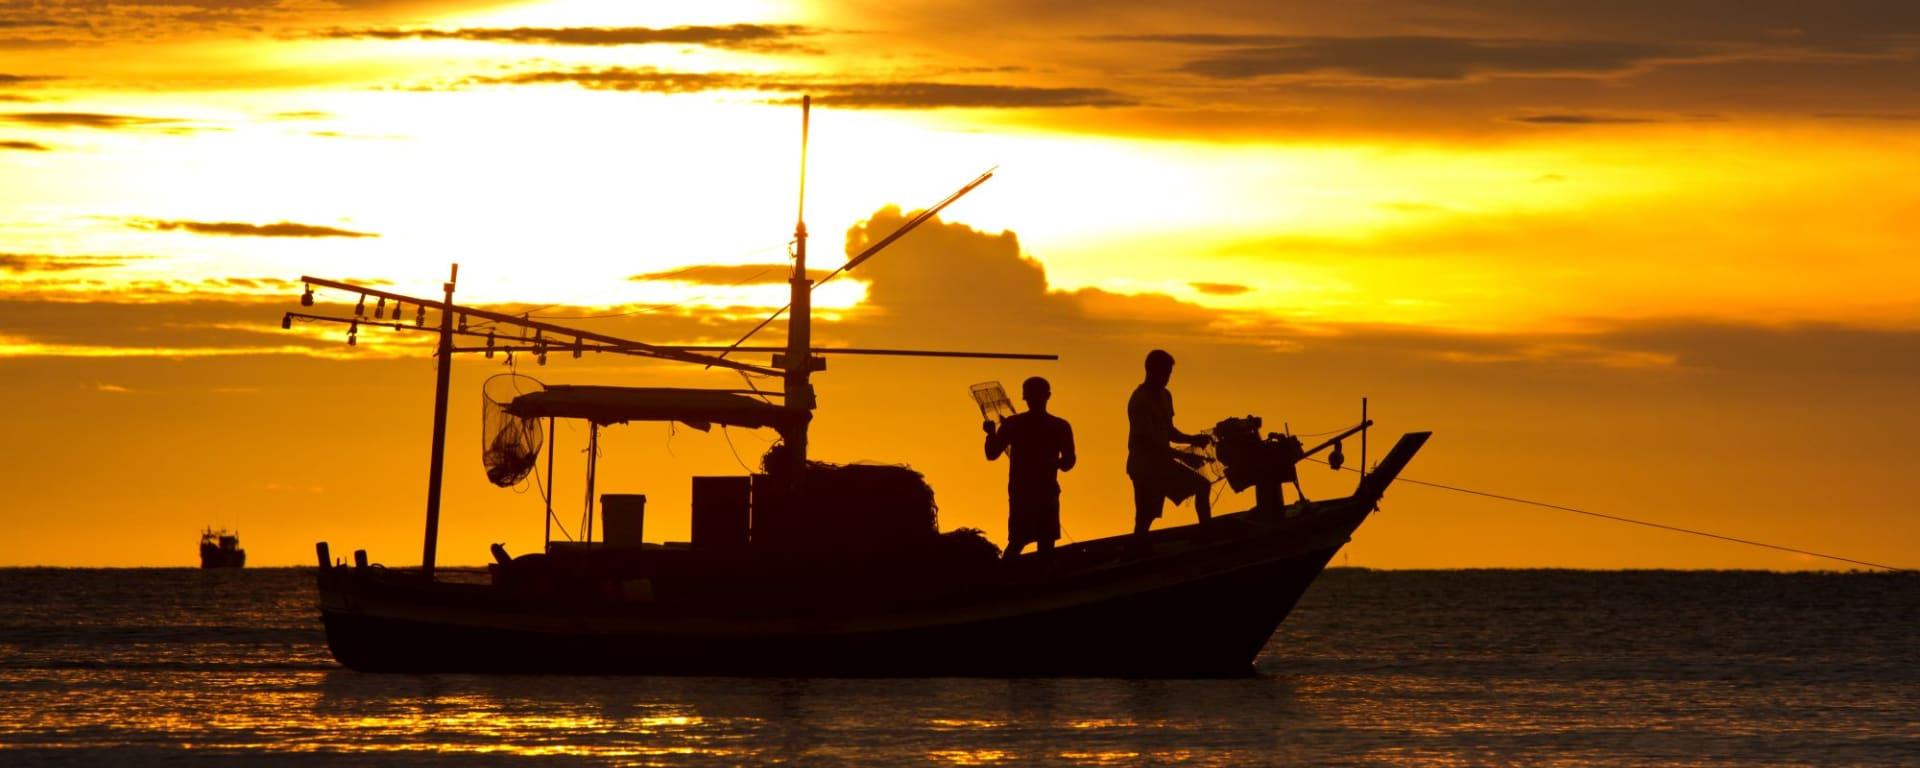 Erlebnisreiches Bali ab Südbali: Bali Fishing Boat